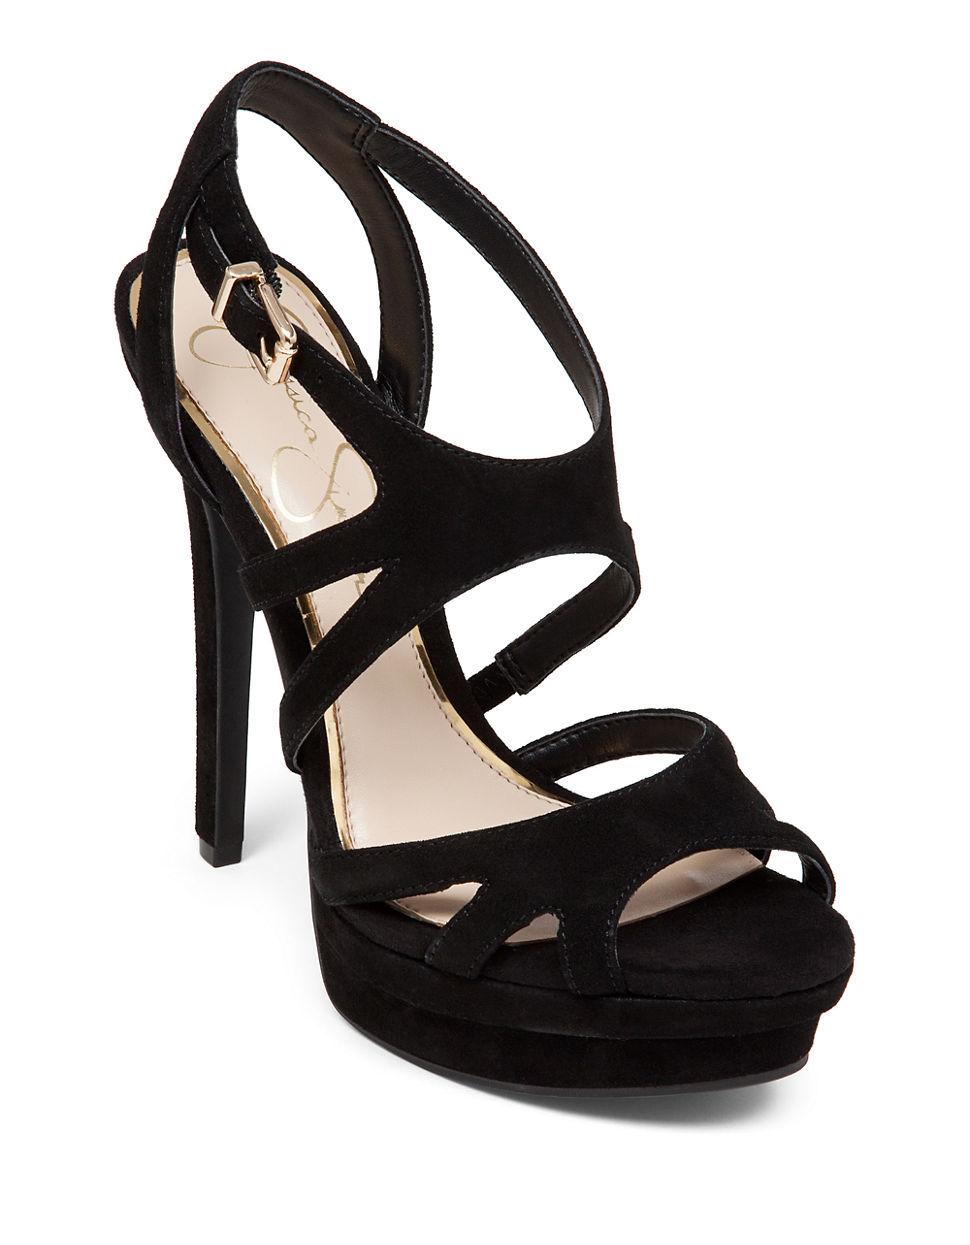 e179cf3b6b8 Jessica Simpson Presslie Suede High-heel Sandals in Black - Lyst